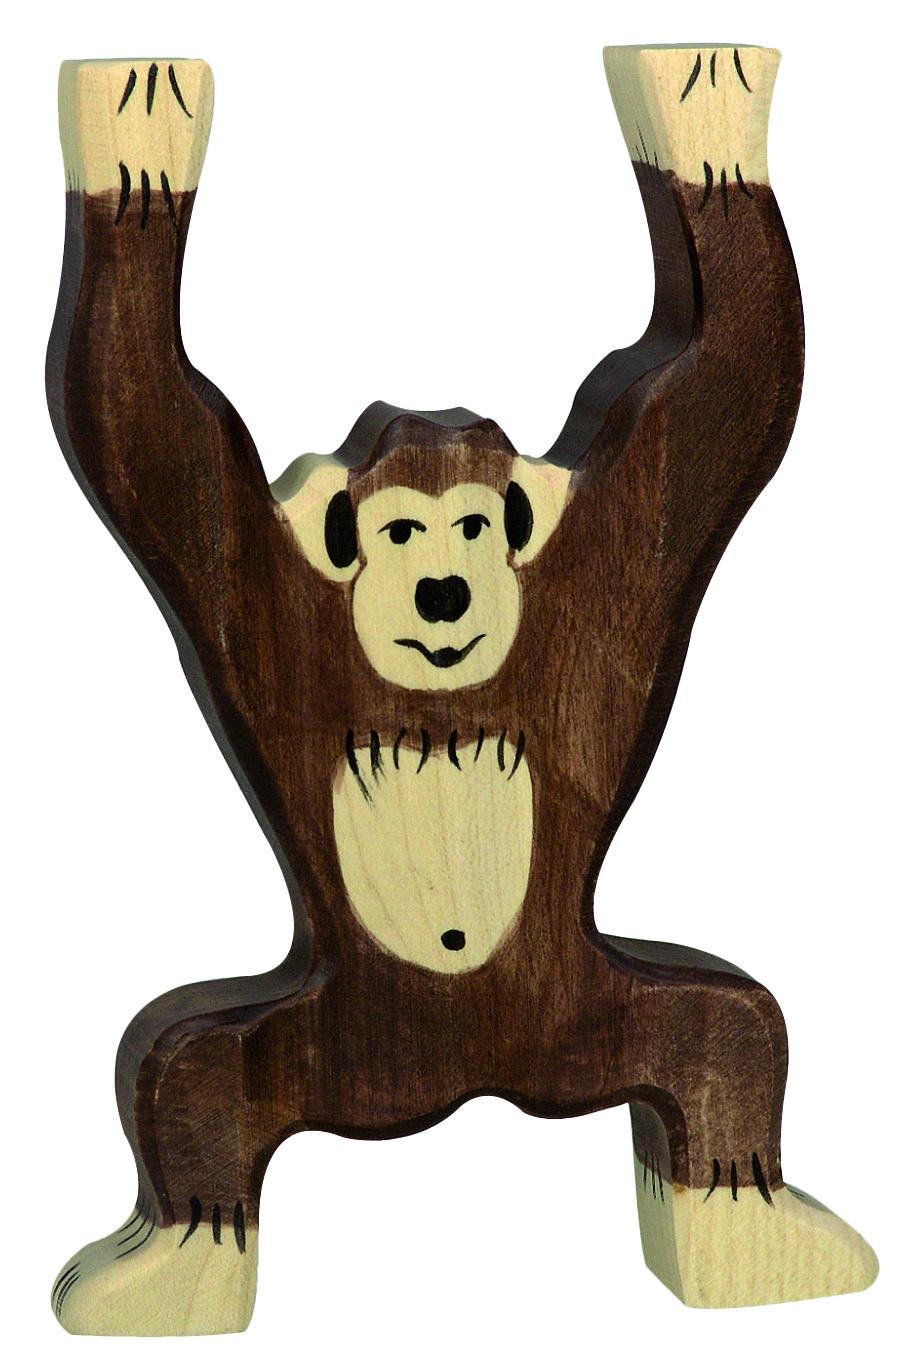 Holztiger Chimpanzee Standing Image